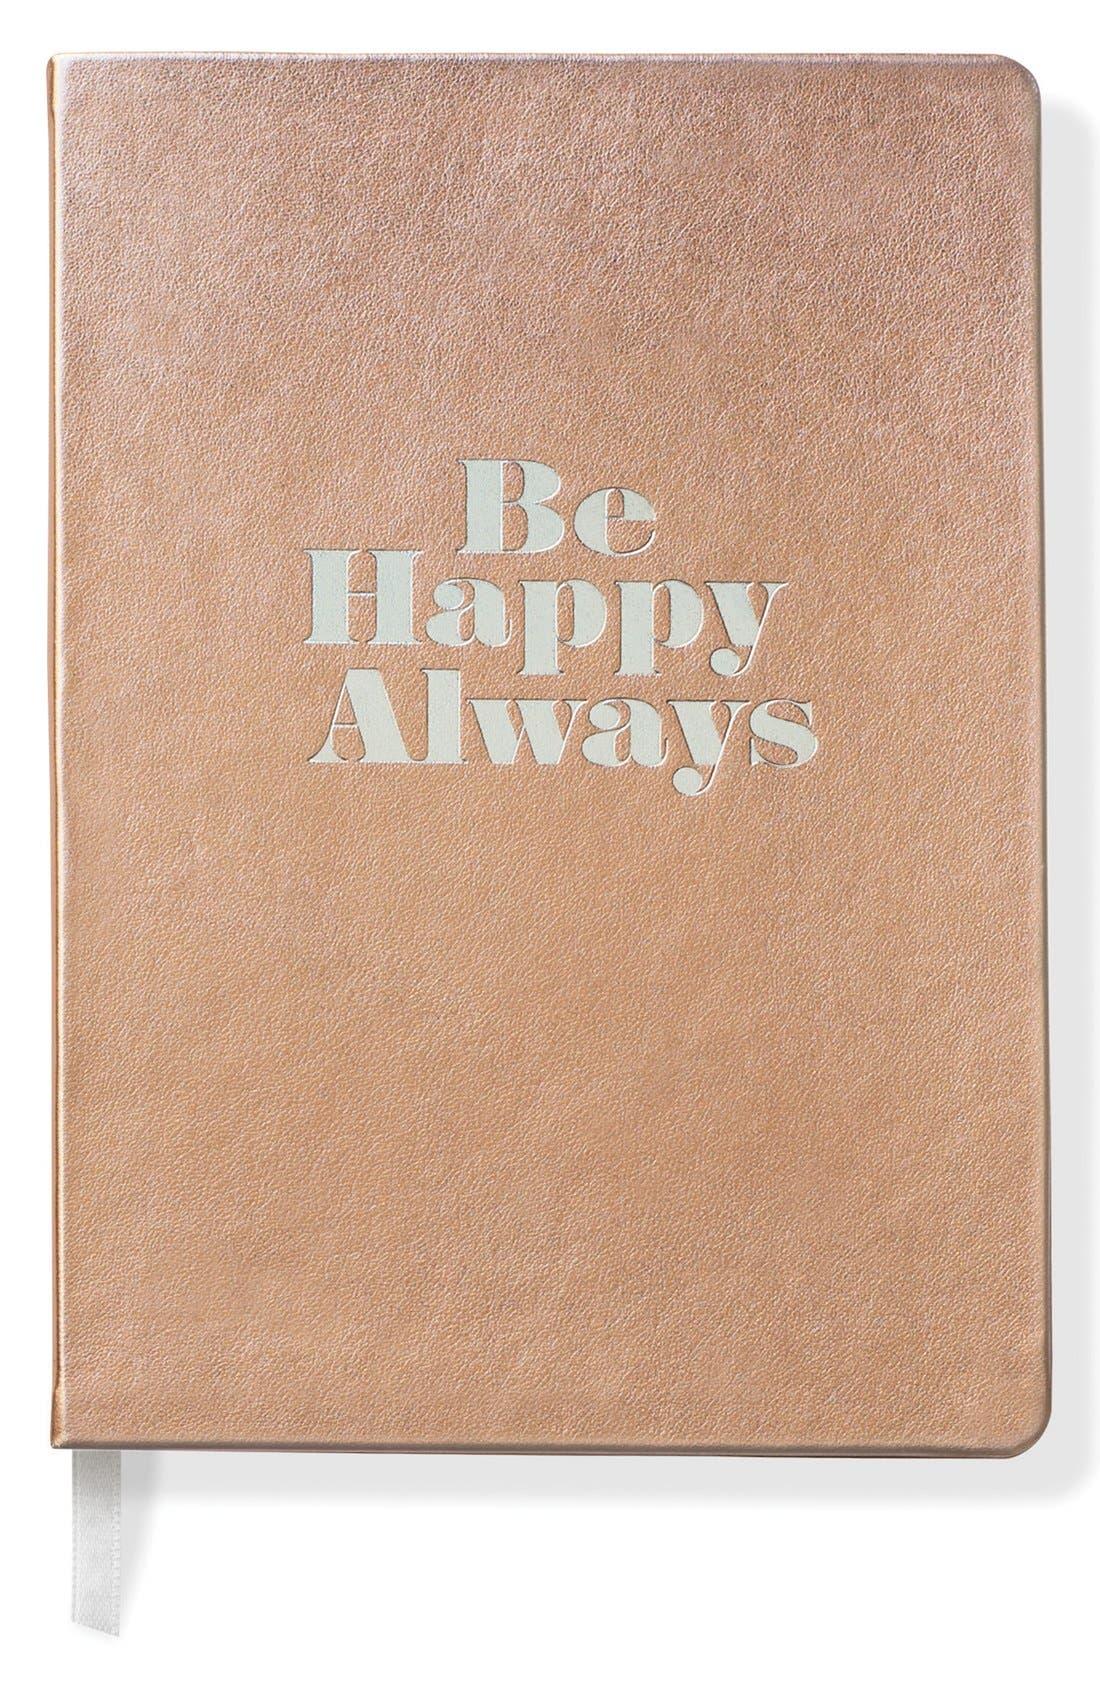 Main Image - Fringe Studio 'Be Happy Always' Softcover Journal